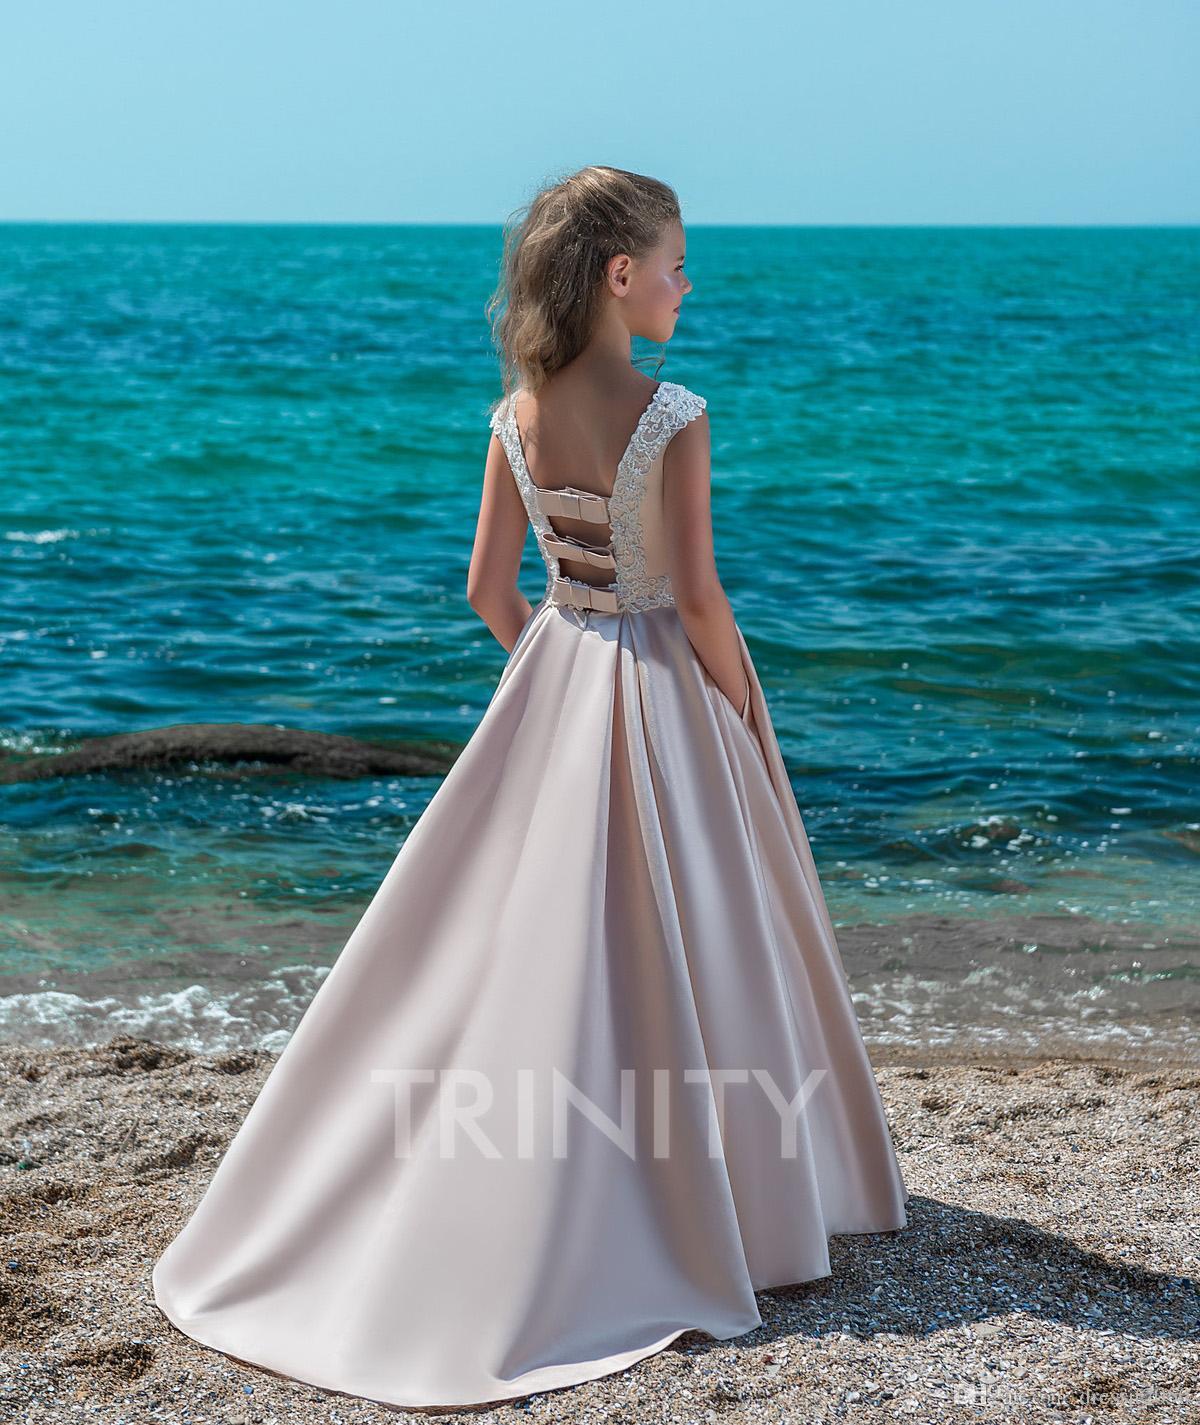 622d86755e5 Pretty Champagne Satin Applique Beads Beach Flower Girl Dresses Girls   Pageant Dresses Holiday Birthday Dress Custom Size 2-14 DF720515